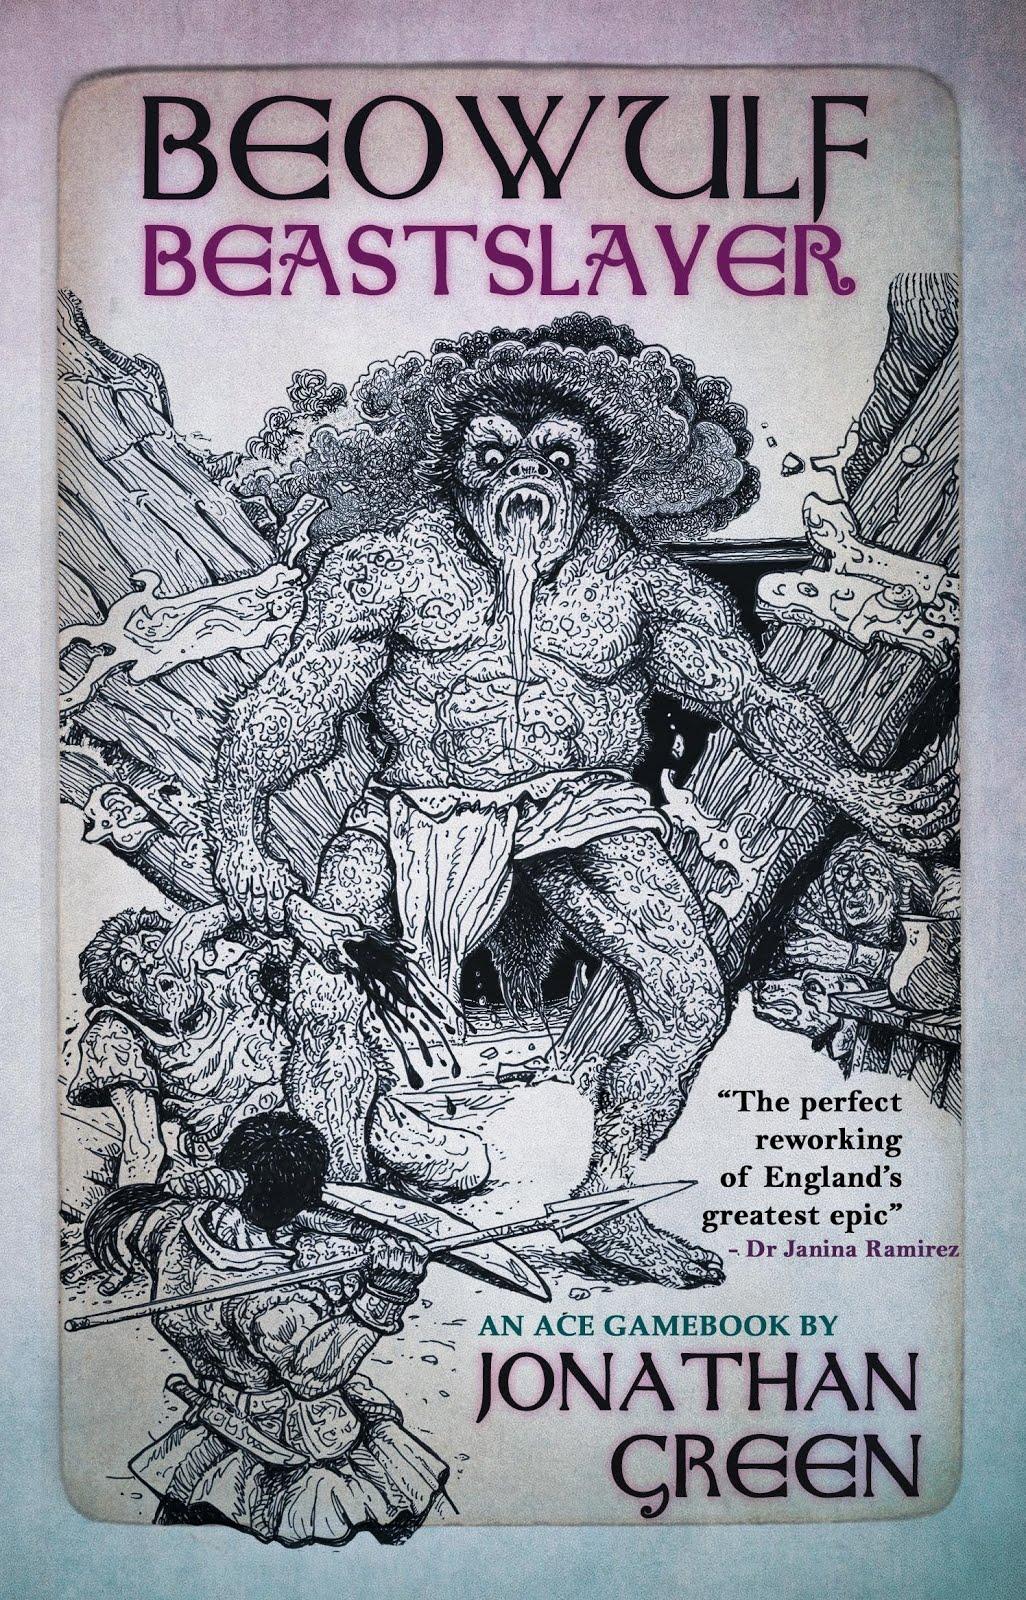 Beowulf Beastslayer